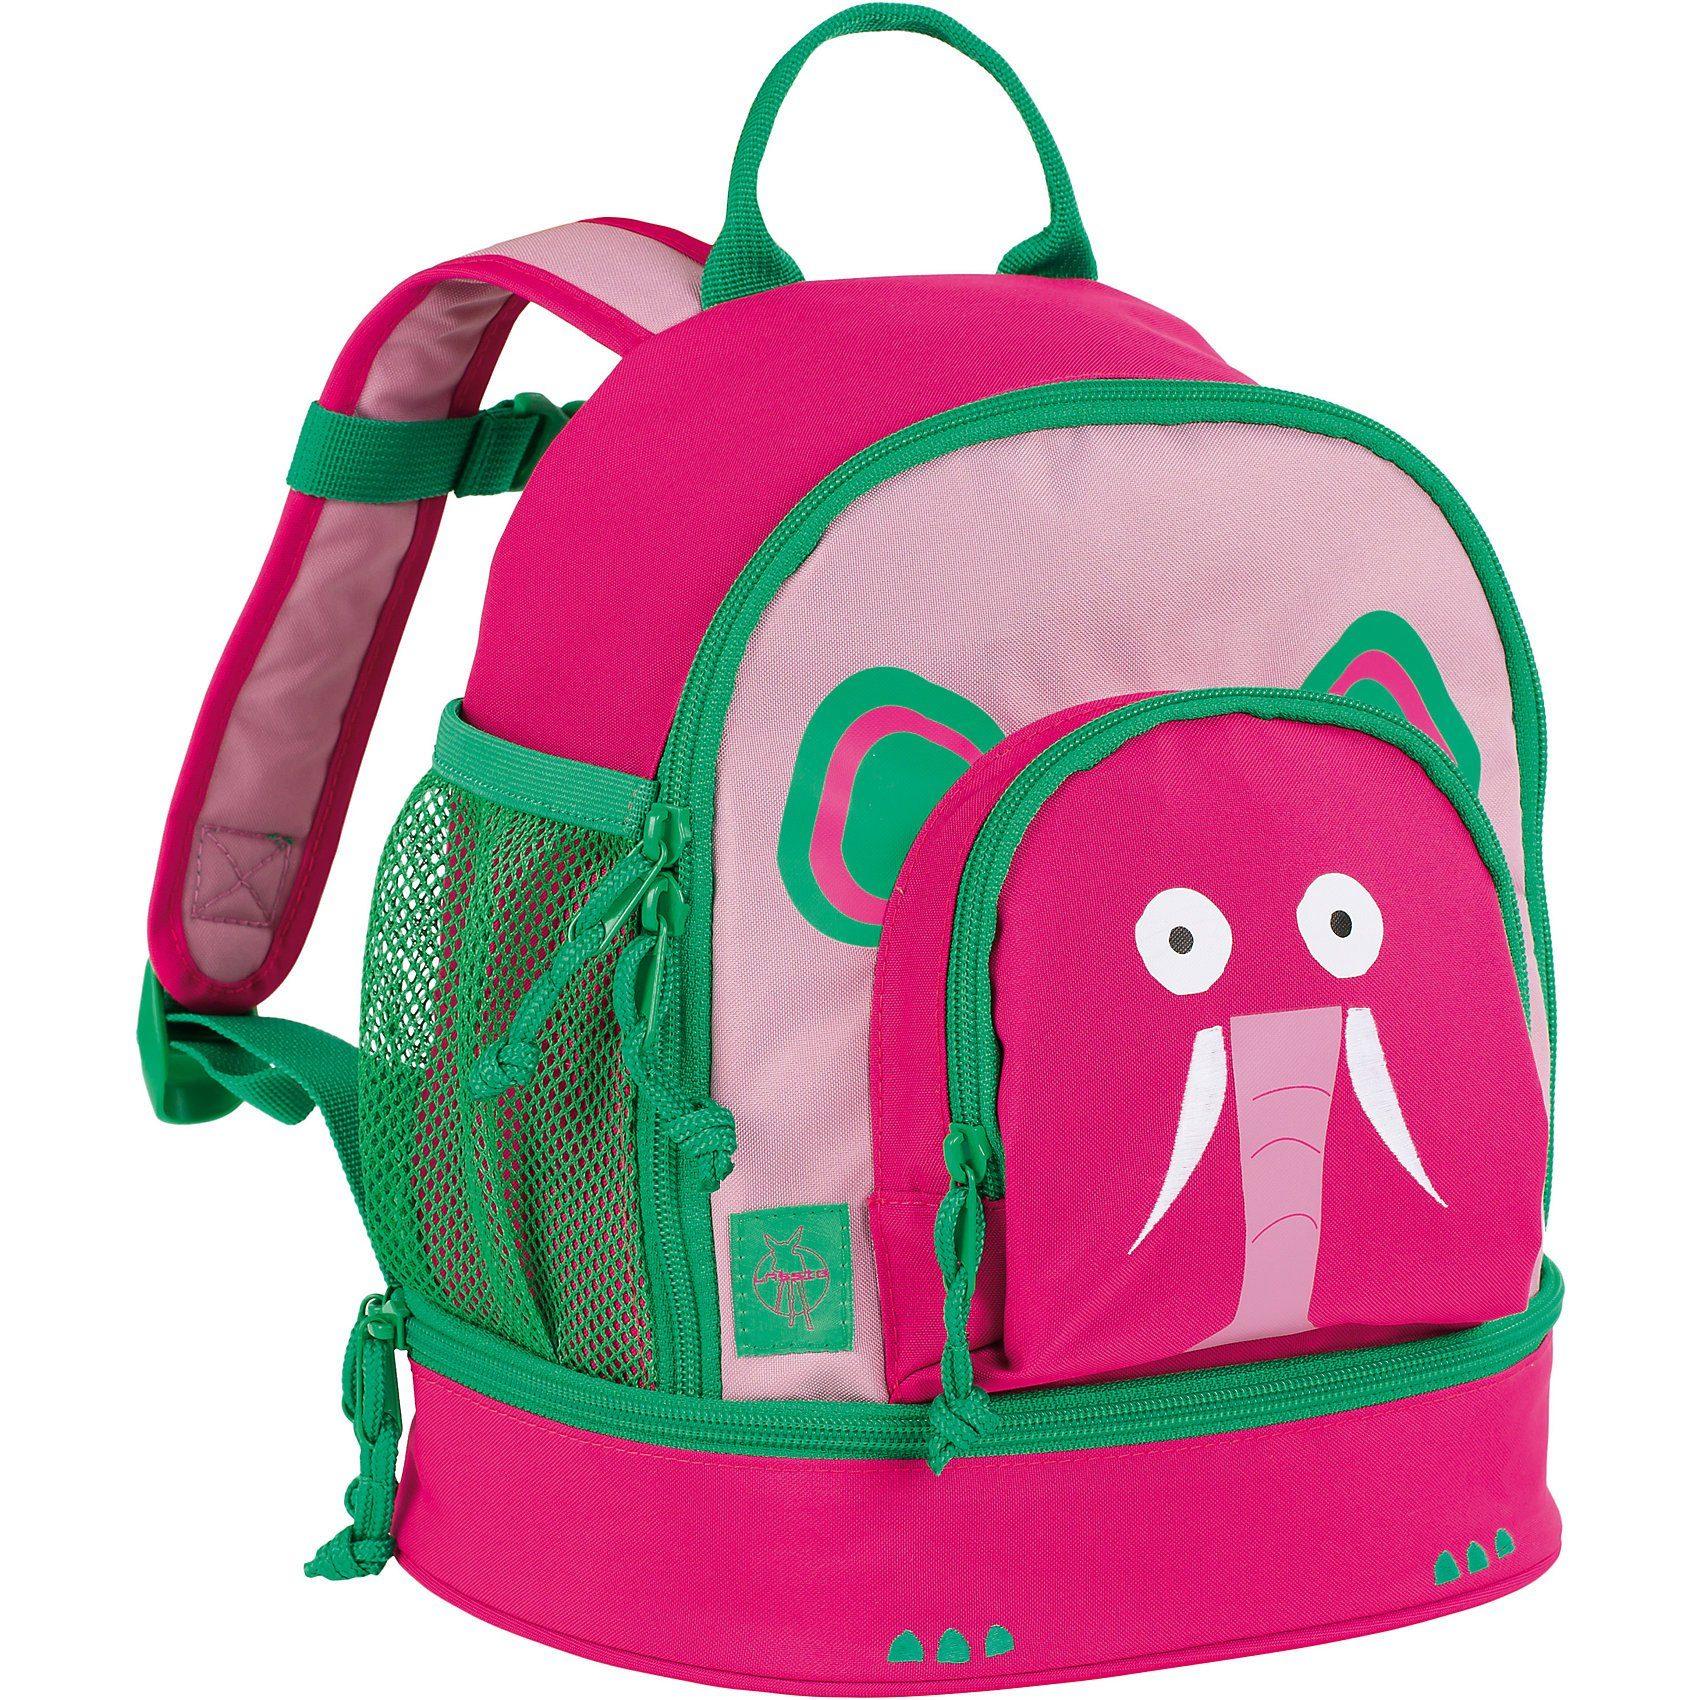 Lässig Kindergarten-Rucksack 4Kids, Mini Backpack, Wildlife Elephan